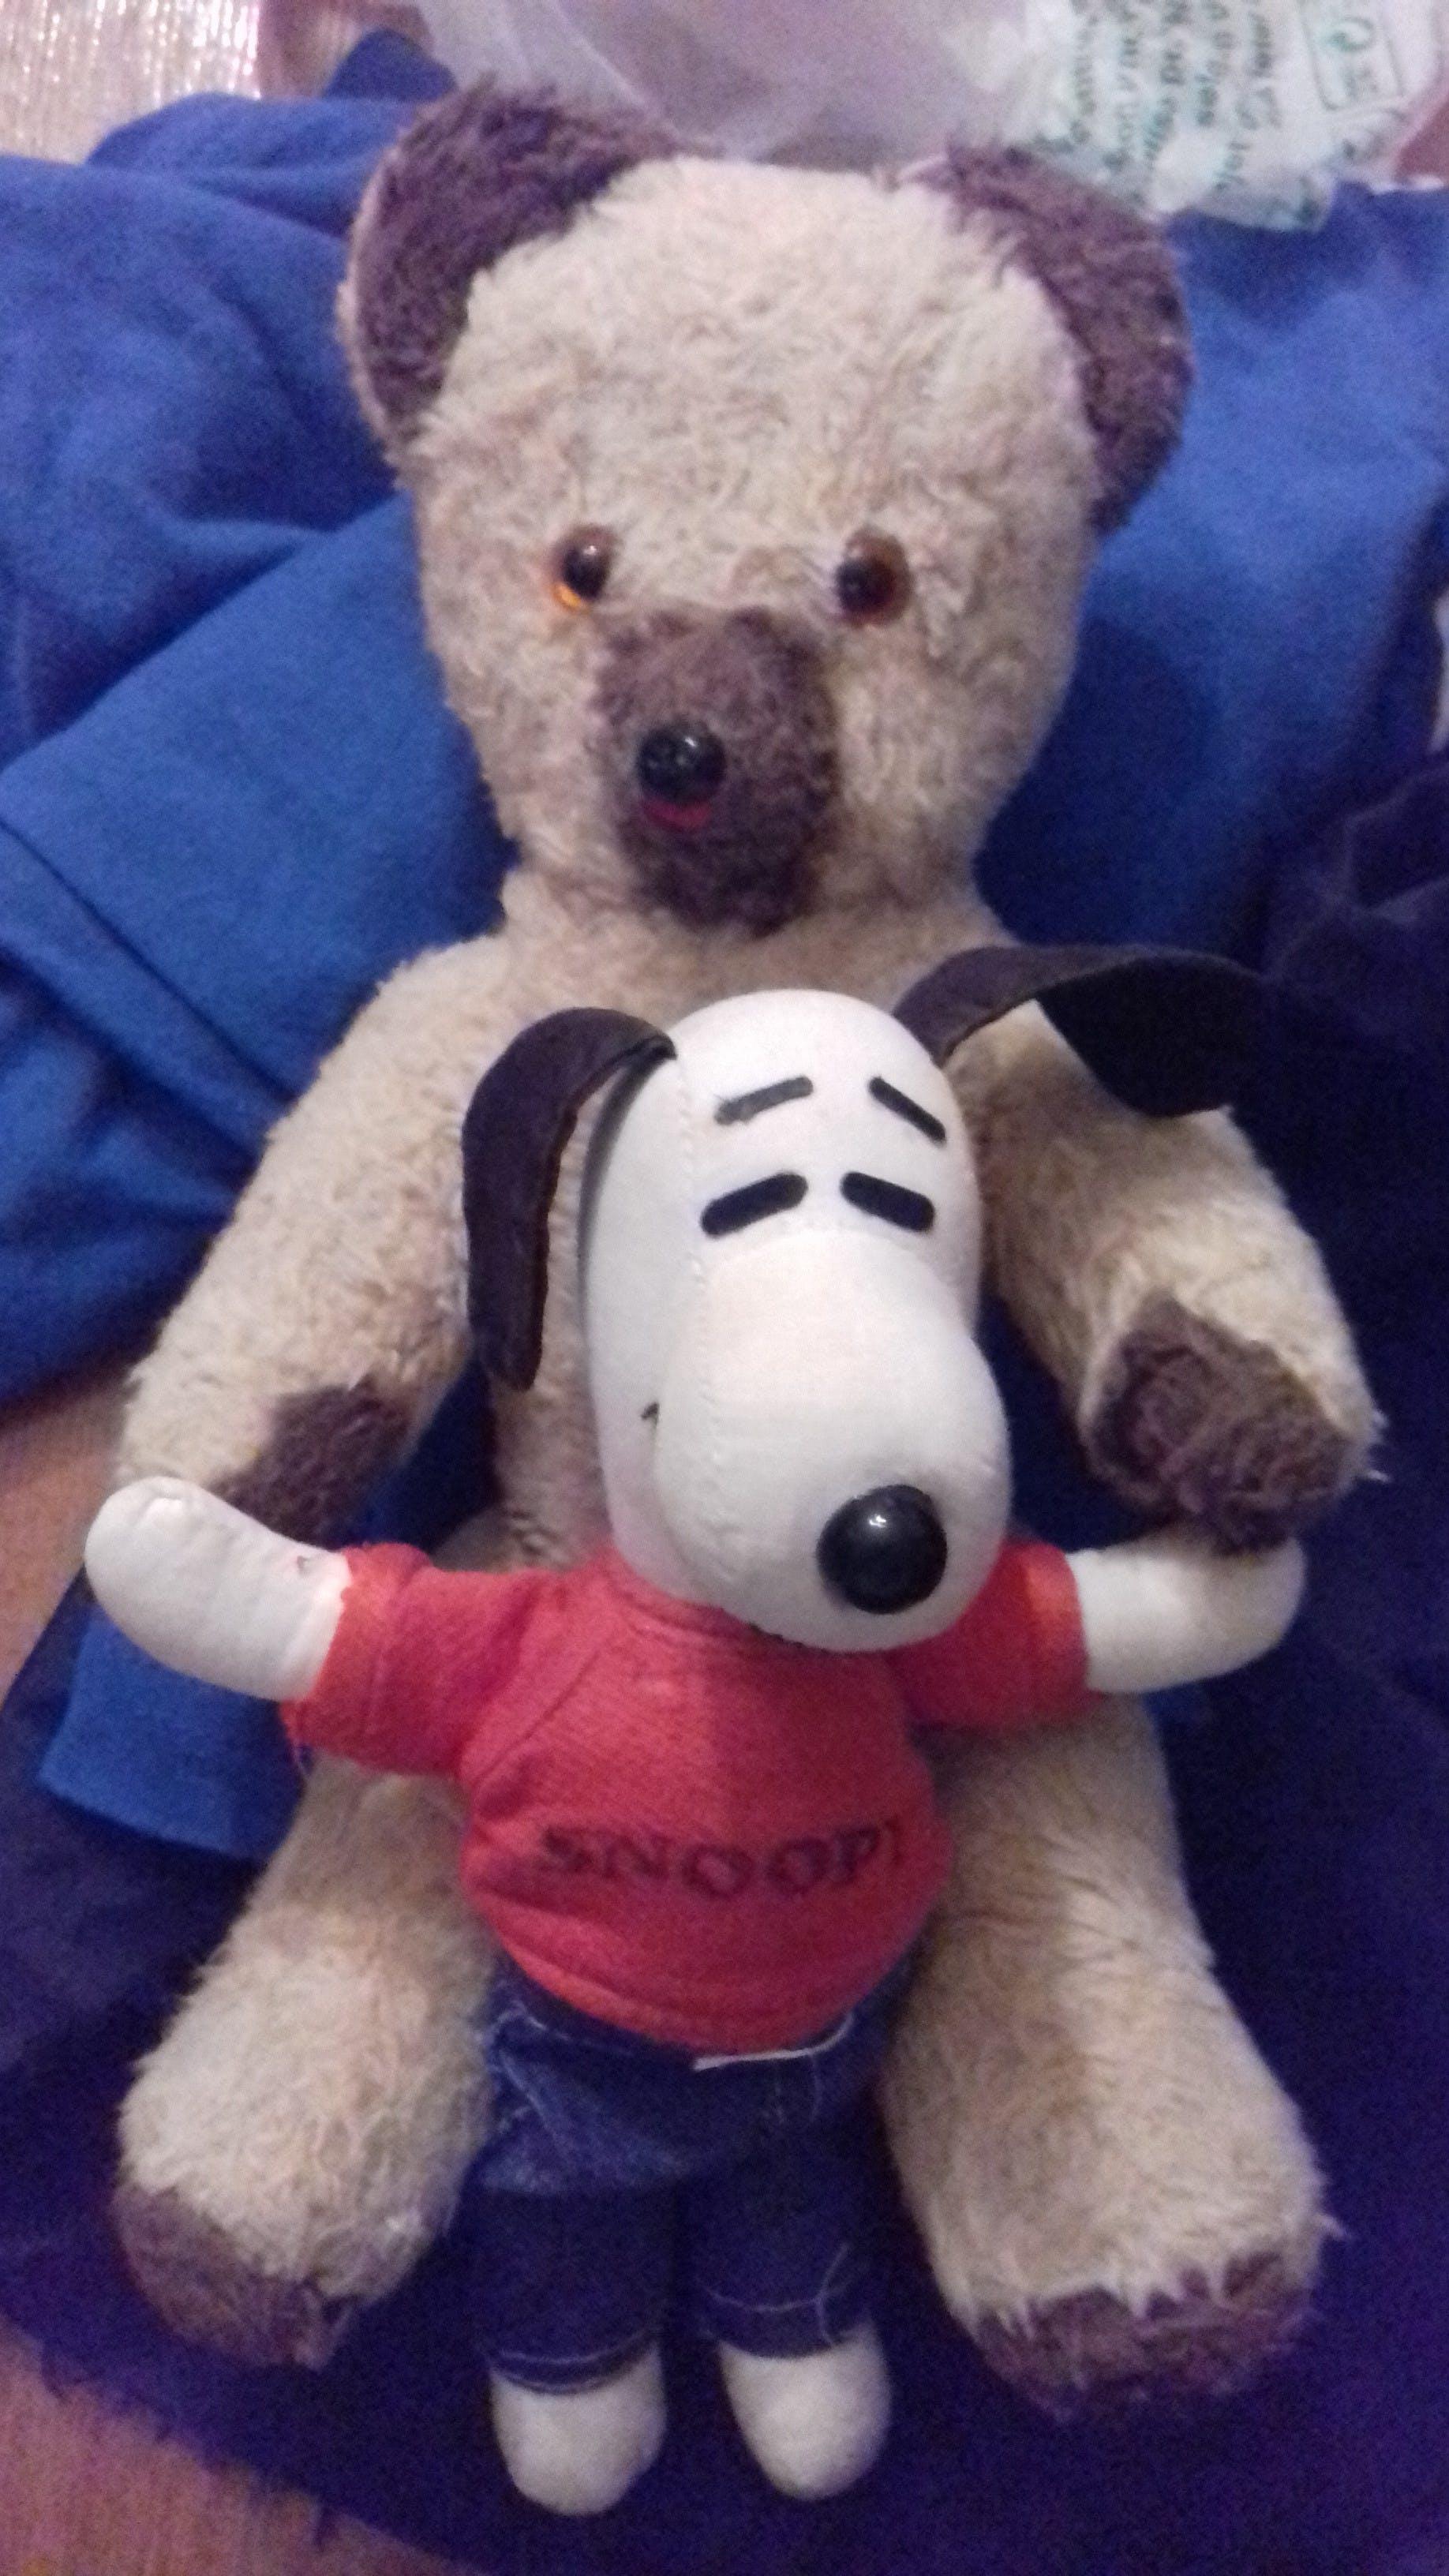 Free stock photo of snoopy, teddy bears